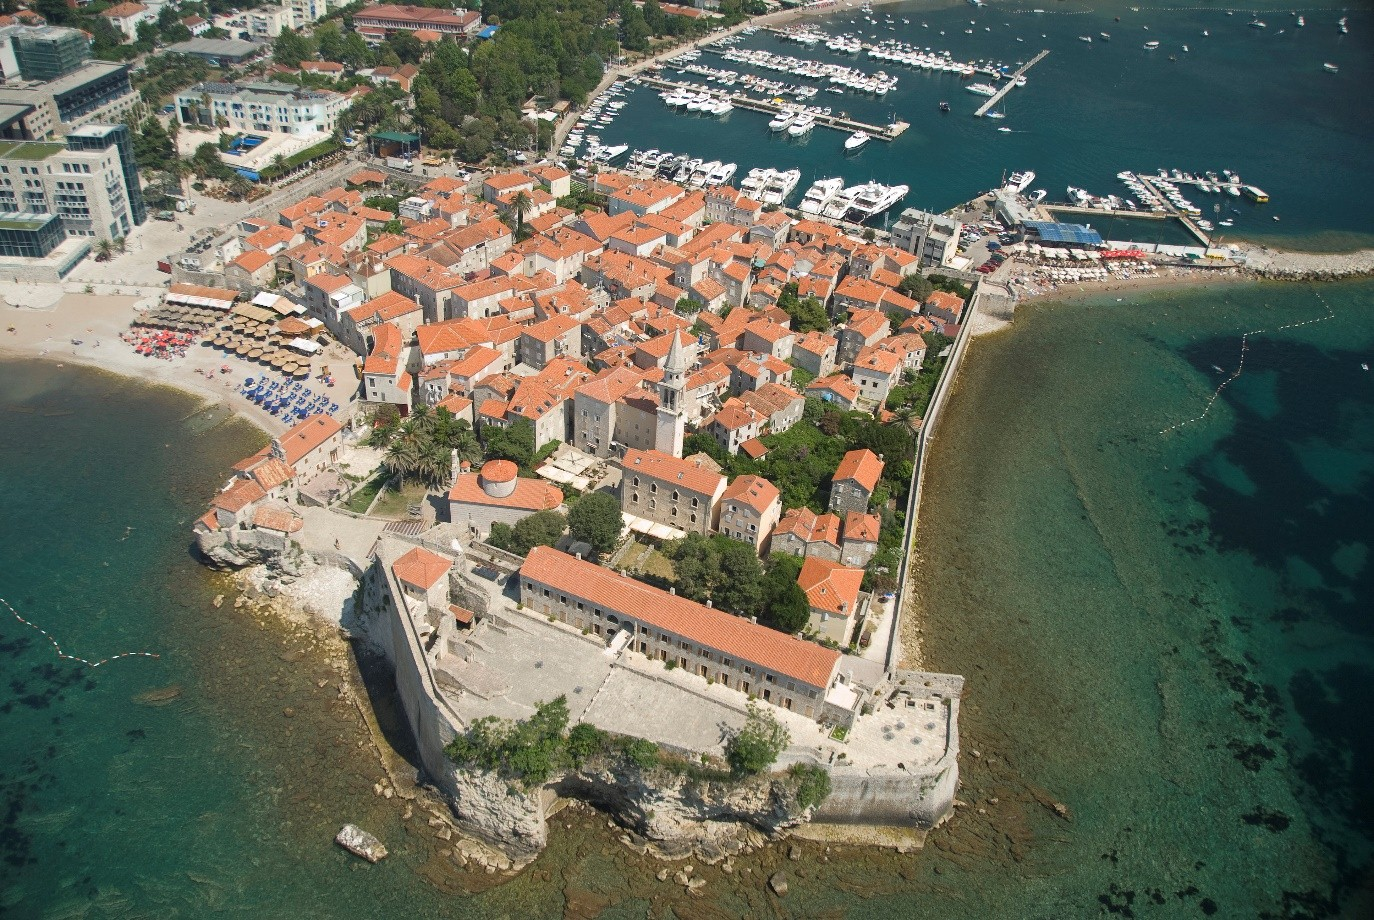 budva-yacht budva-beach-bar budva-old-town montenegro budva-restaurants